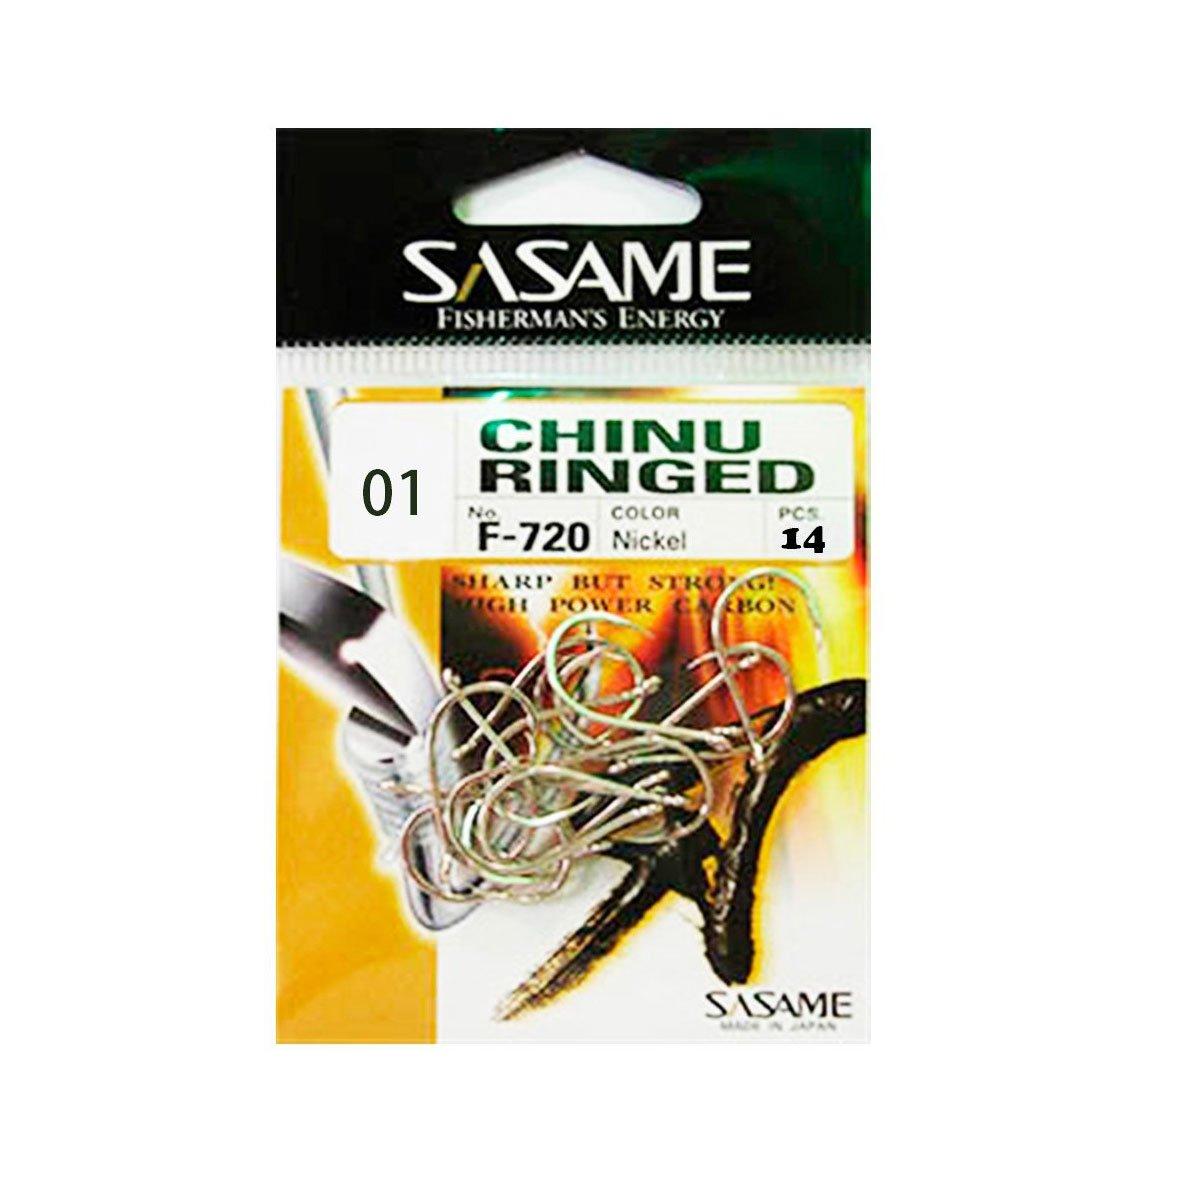 Anzol Sasame F720 Chinu Ringed